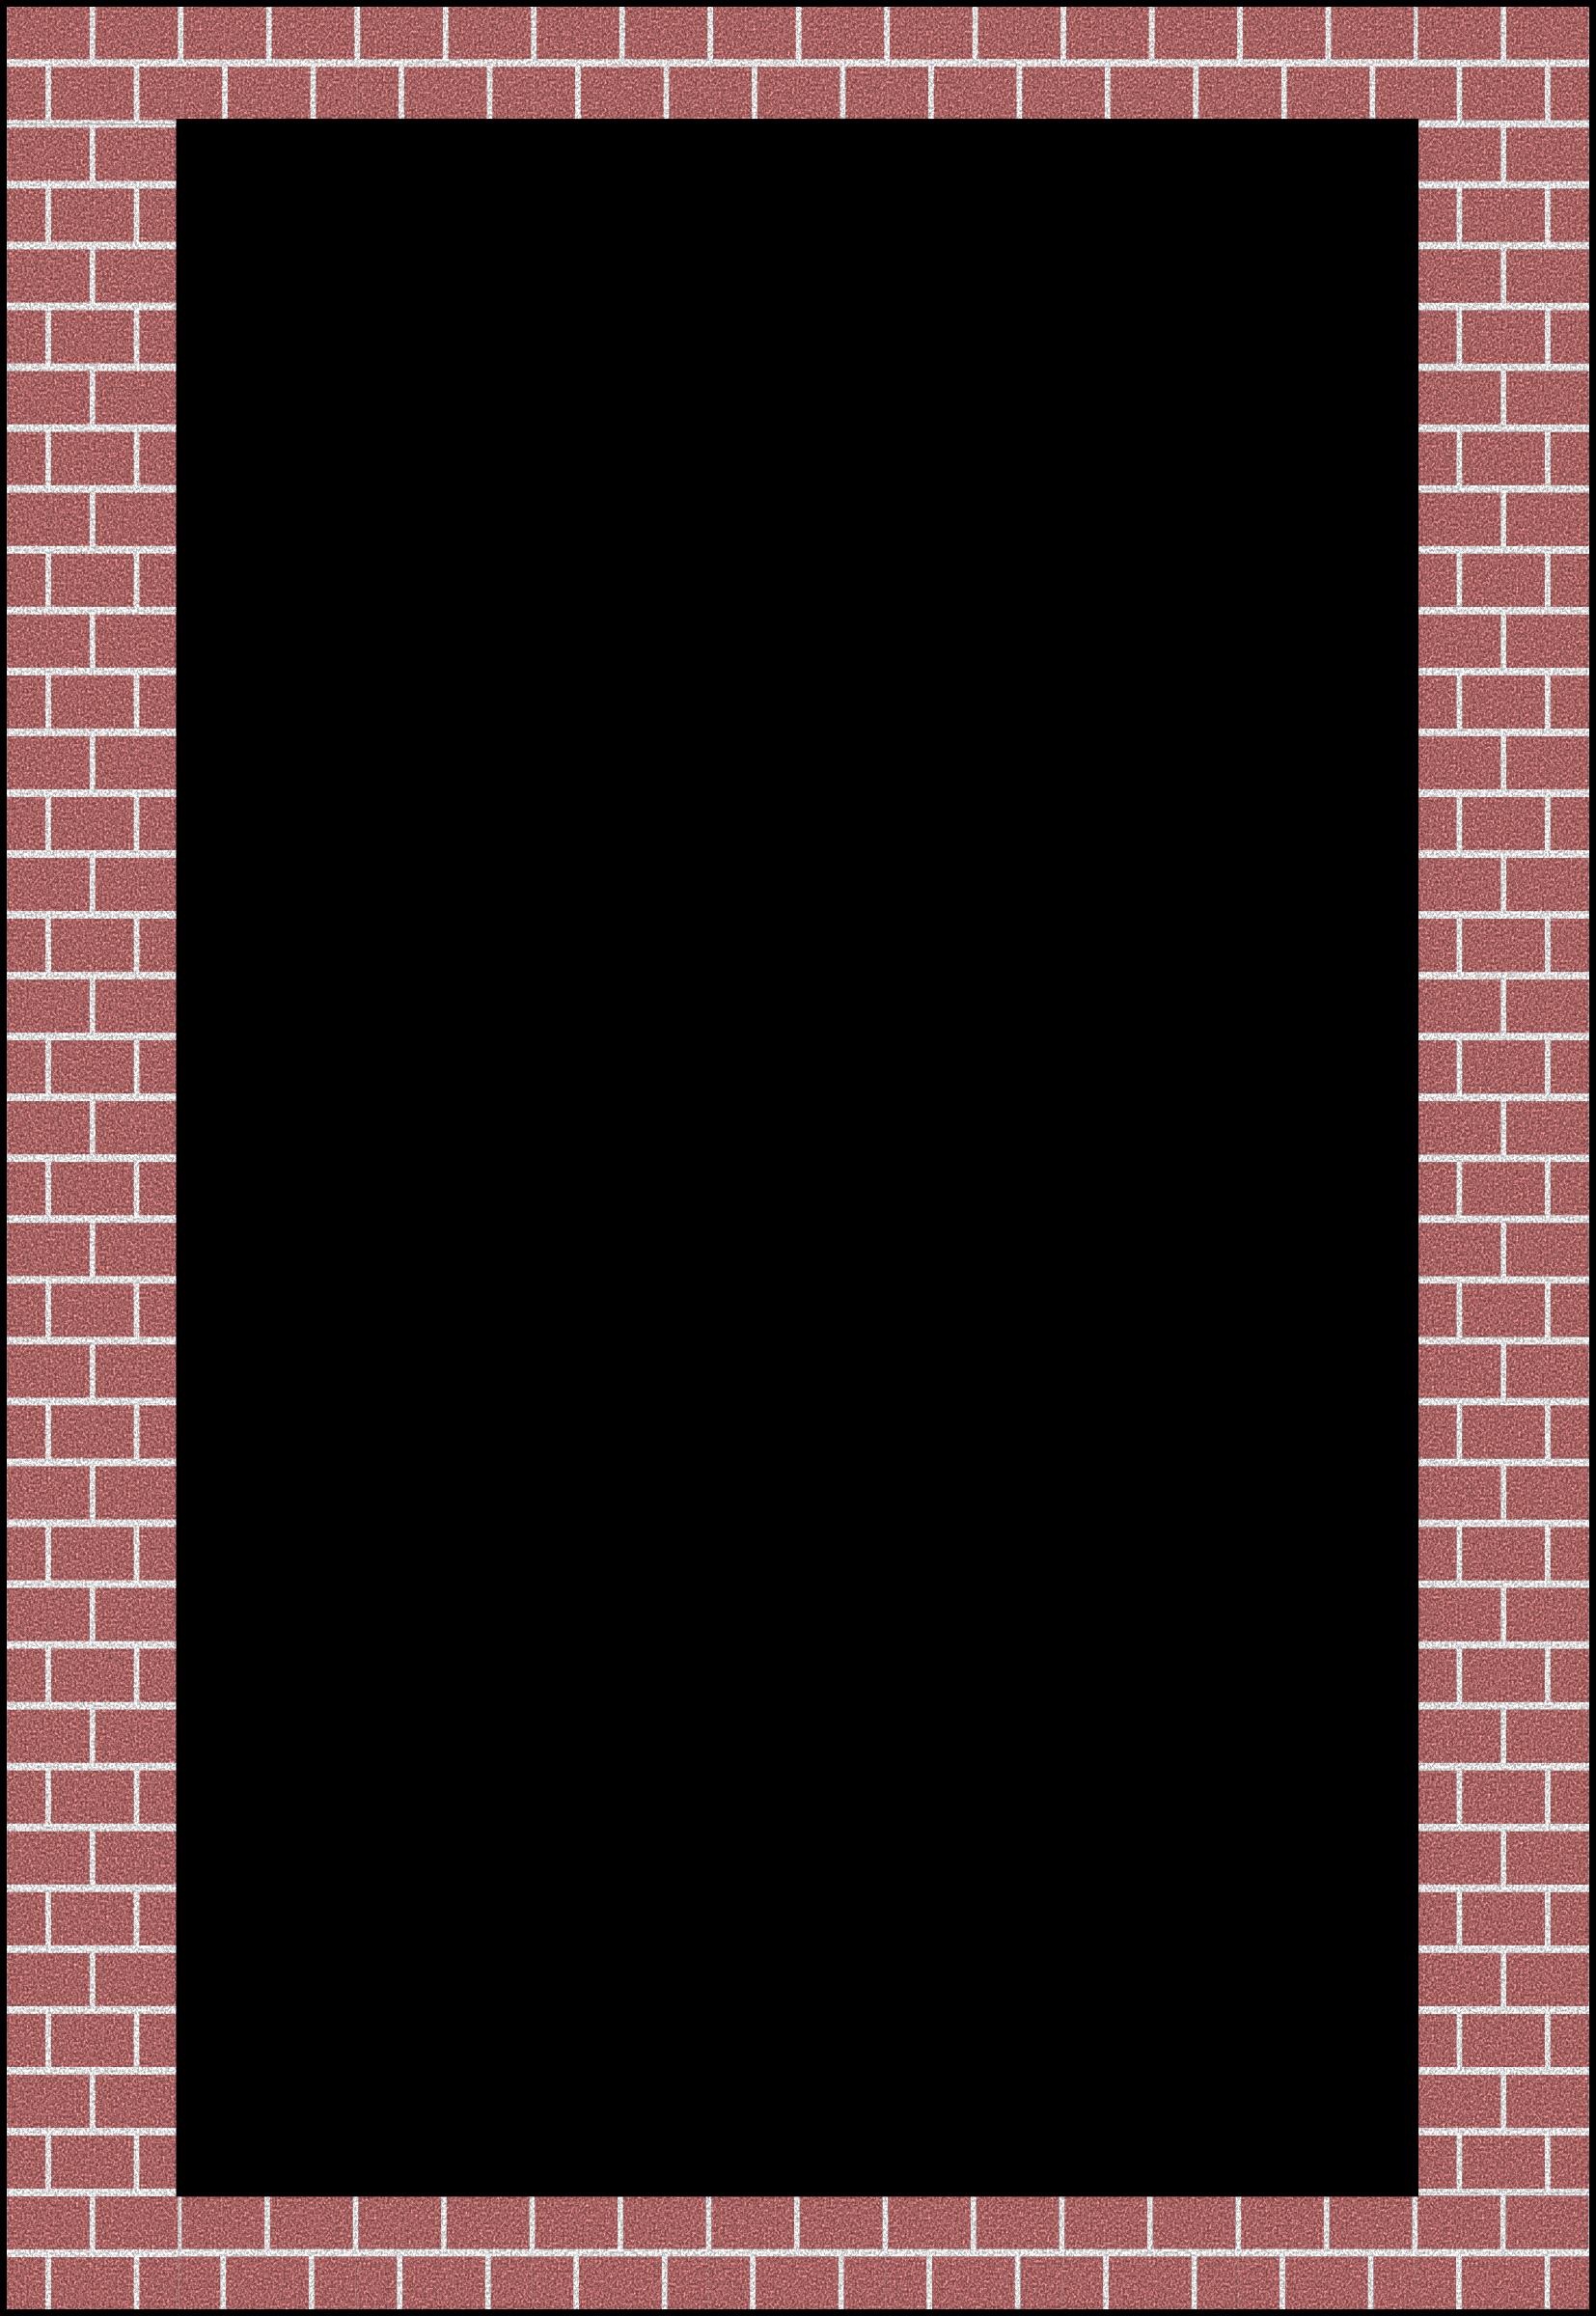 Brick border. Legos clipart frame